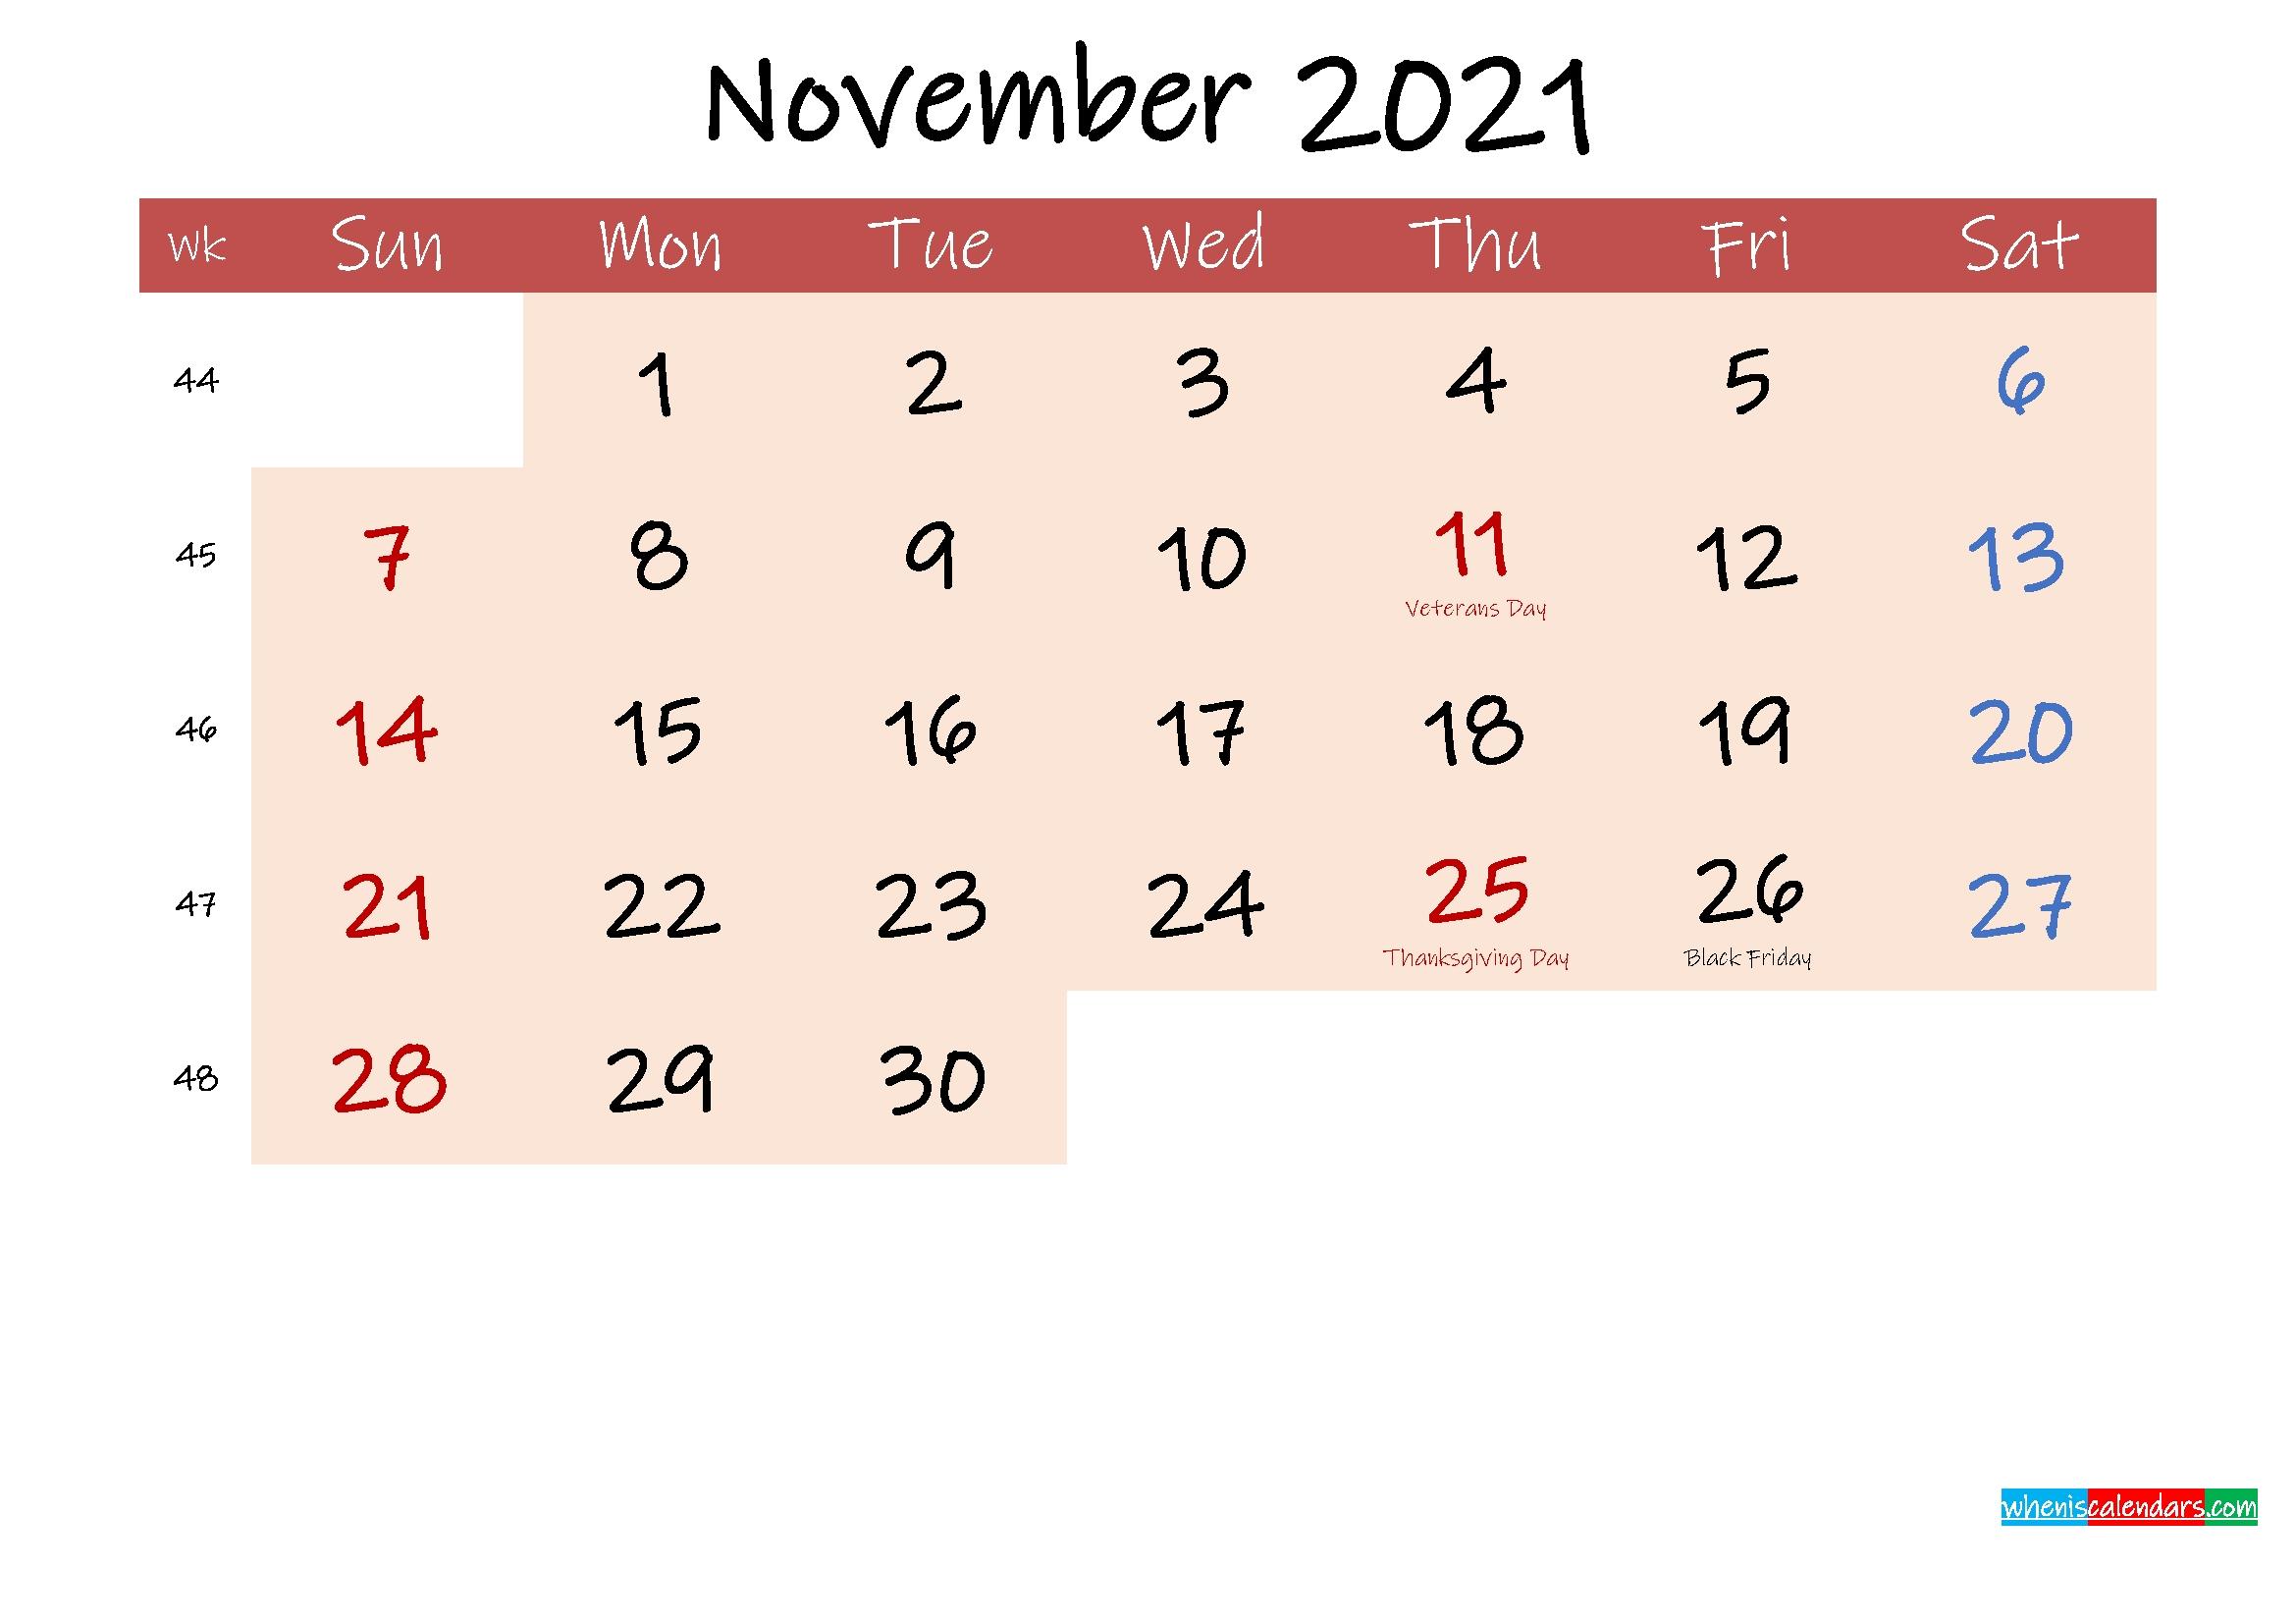 Free Printable Coloring Calendar 2021 November - Template No.ink21M203 November 2021 Calendar Quiz